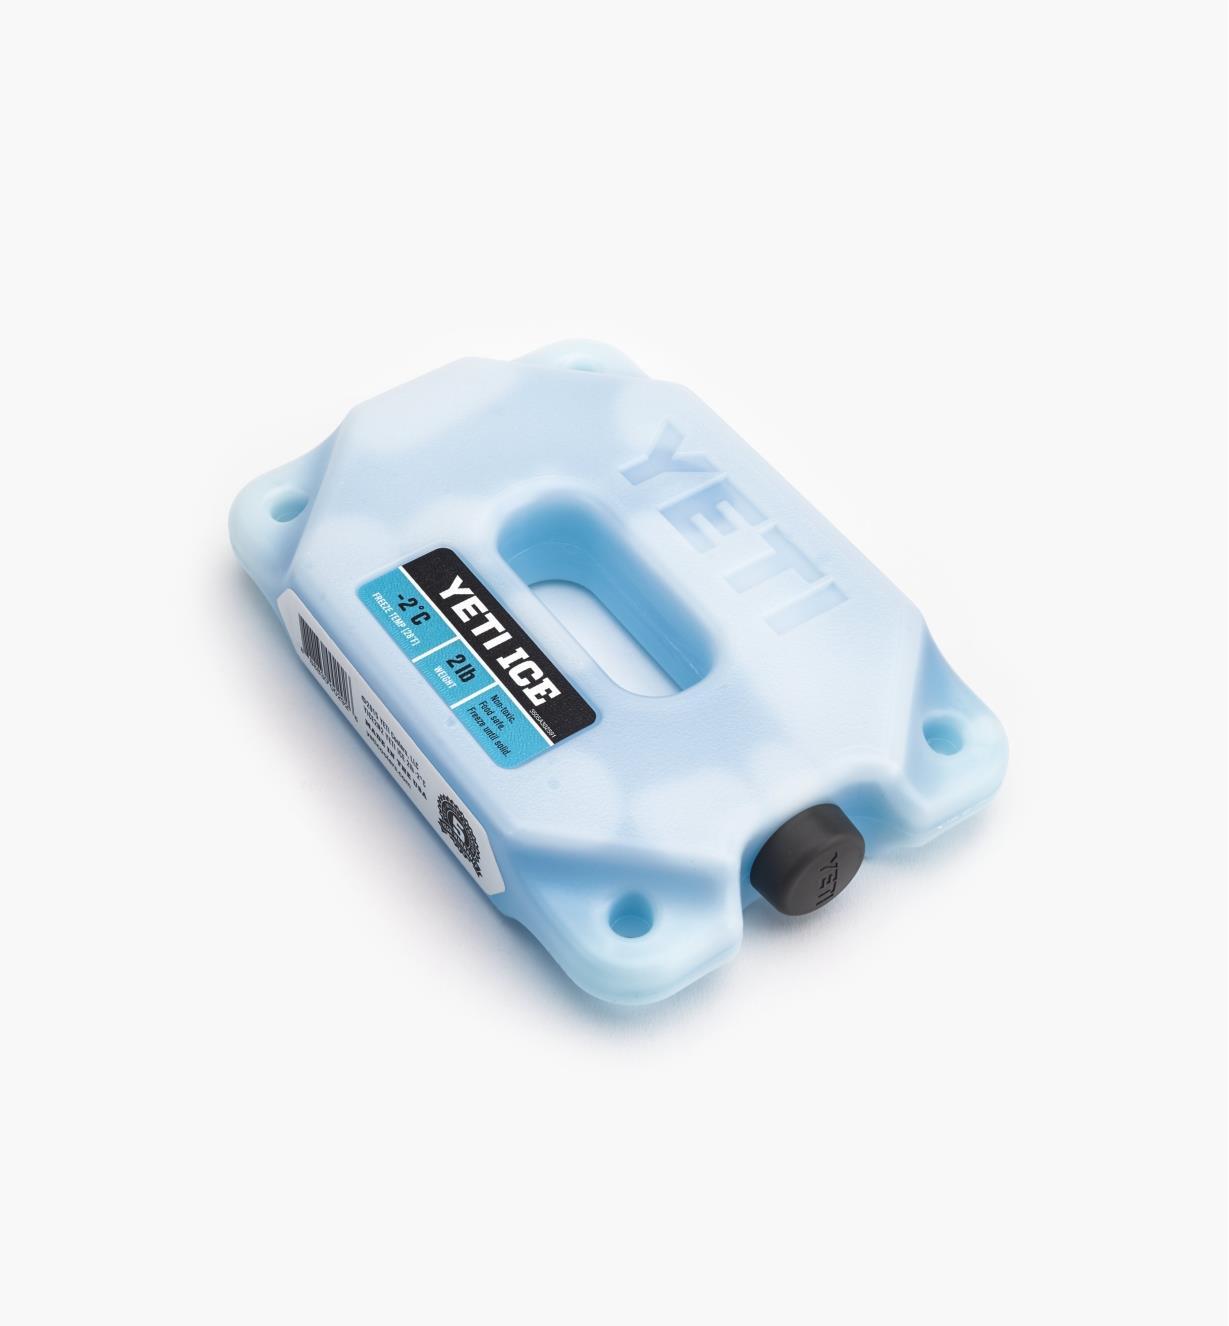 "74K0091 - 2 lb Yeti Ice Pack, 8"" x 5 3/8"" x 1 9/16"""